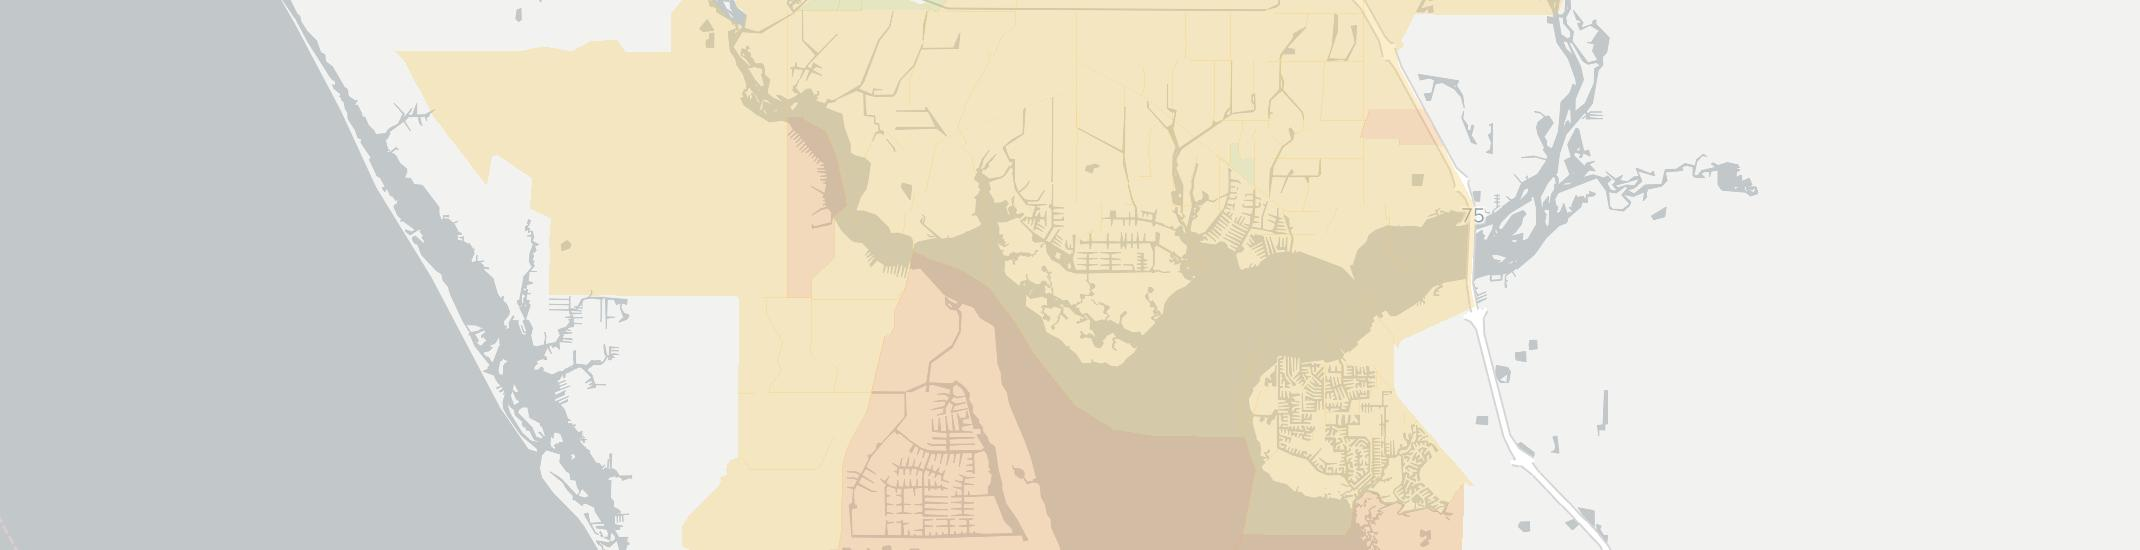 Map Of Port Charlotte Florida.Internet Providers In Port Charlotte Compare 15 Providers